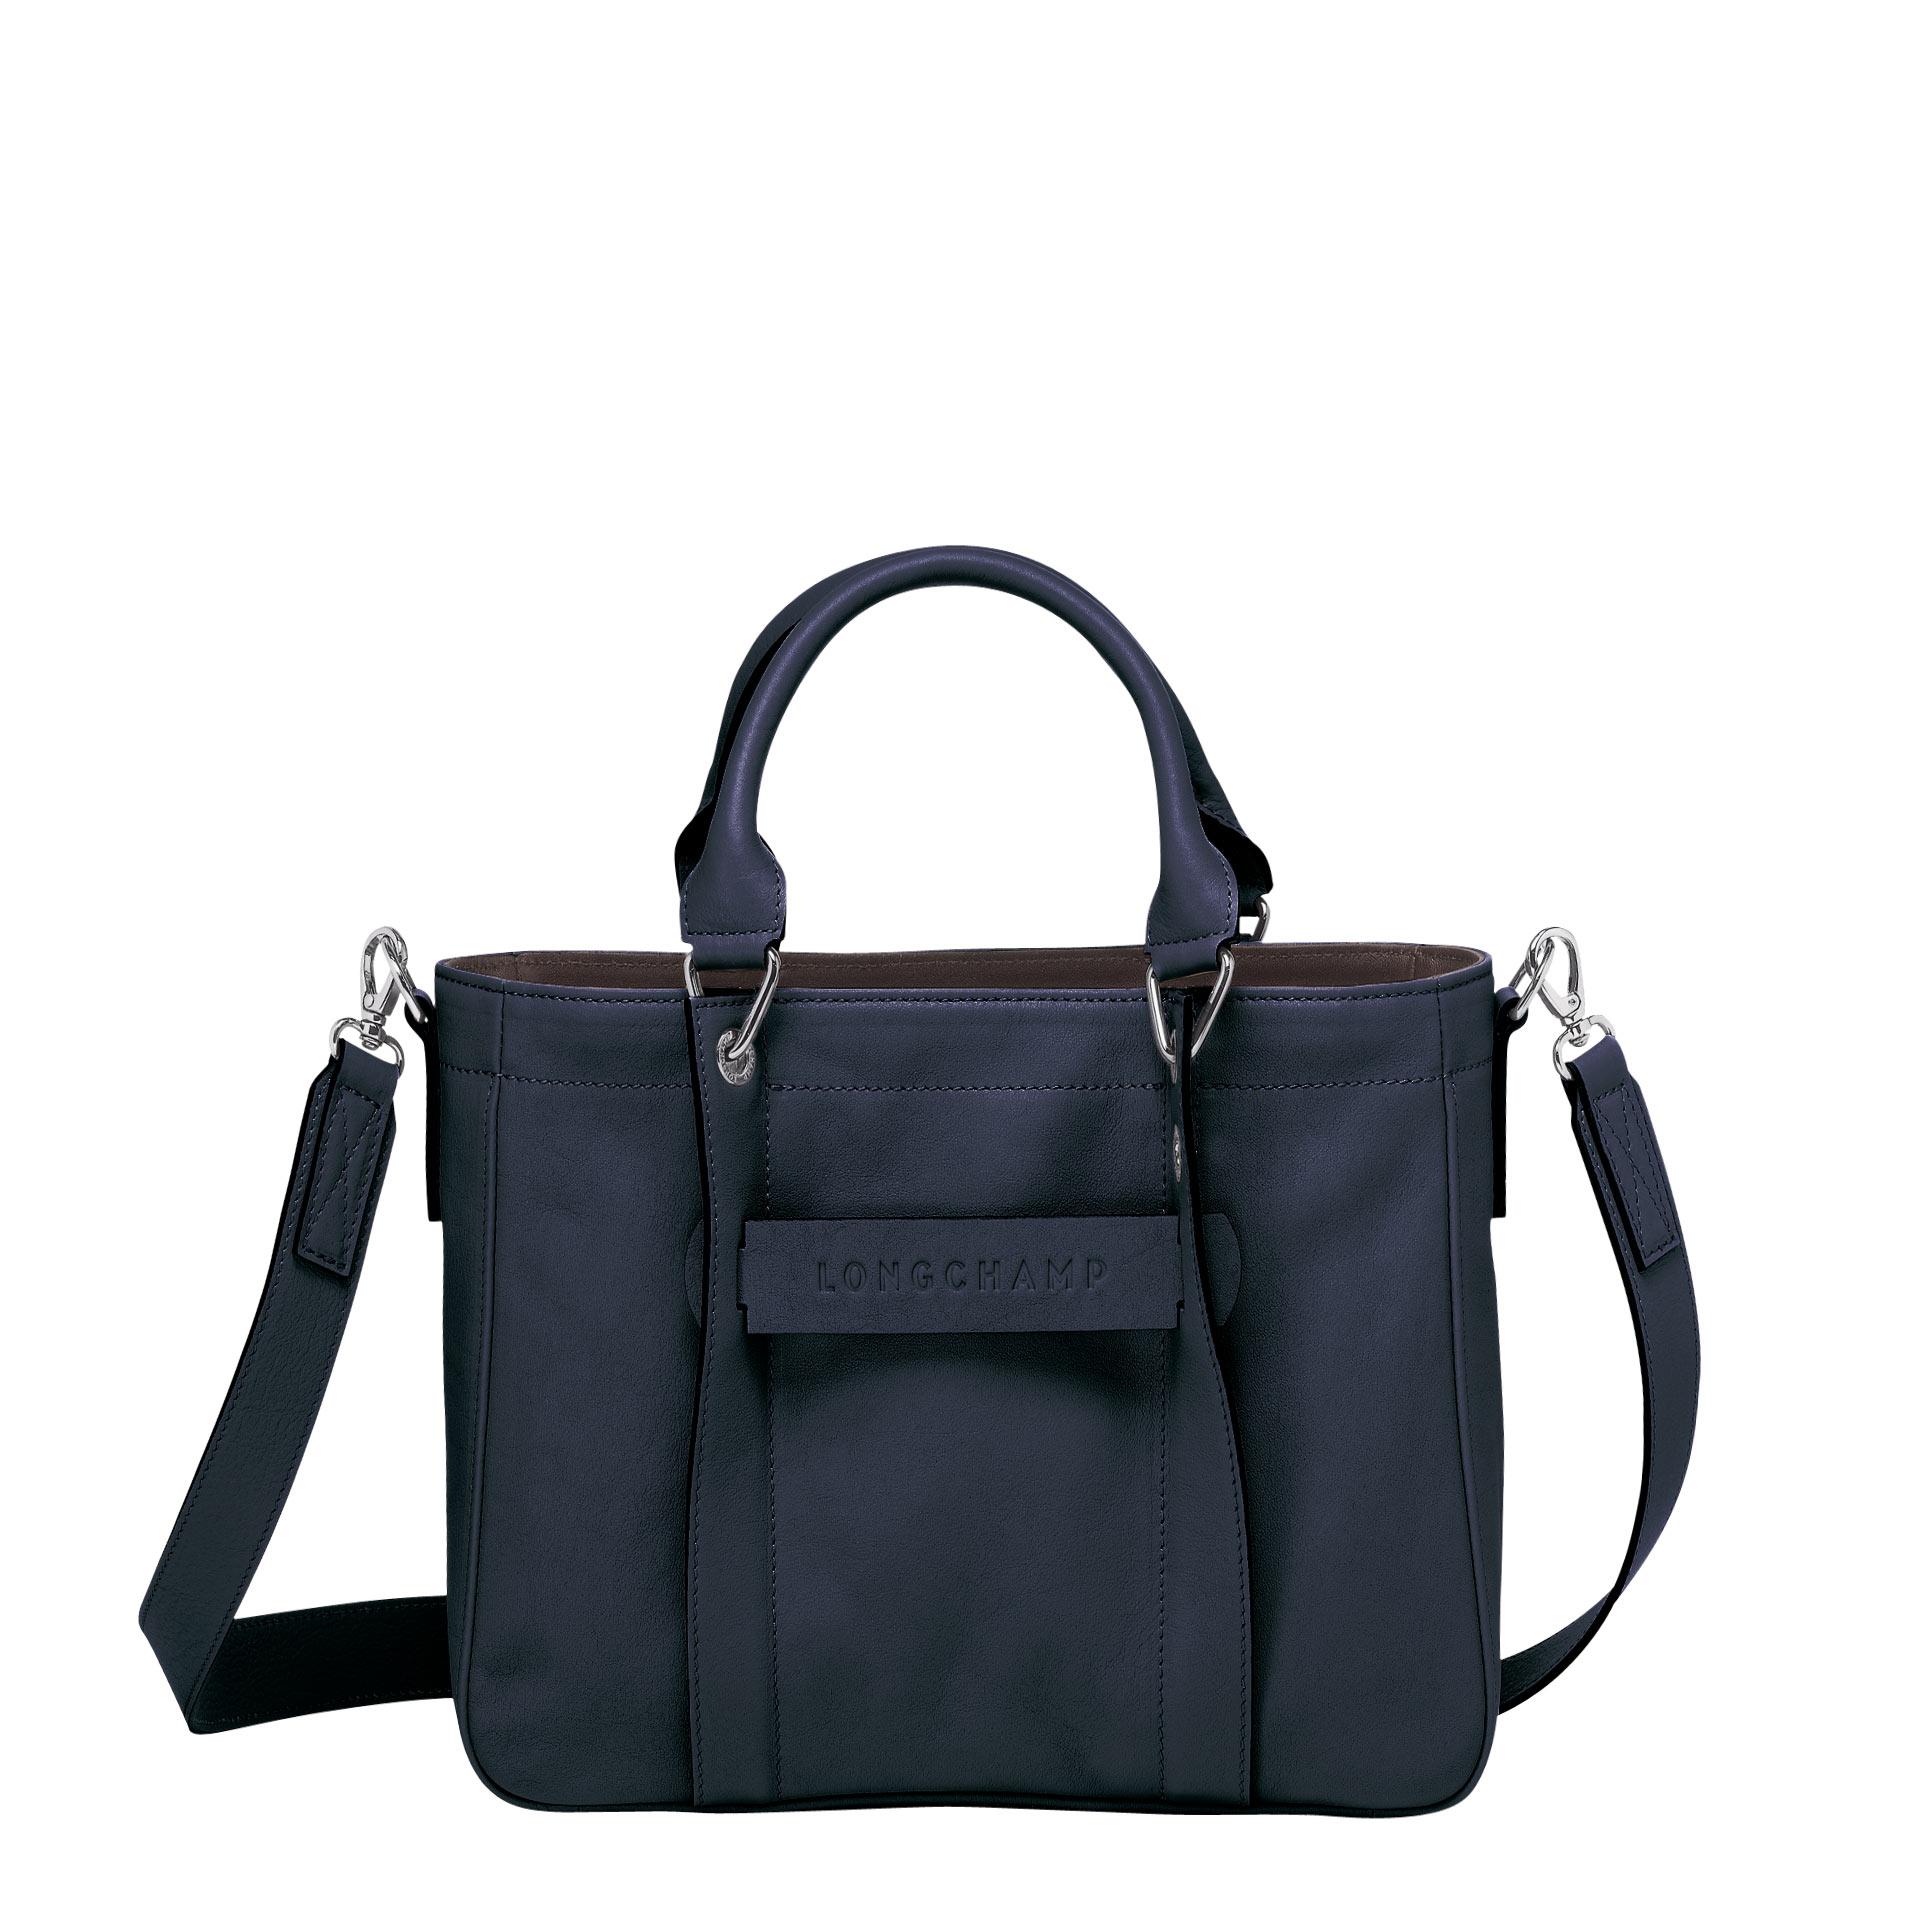 3D Handtasche S mitternachtsblau